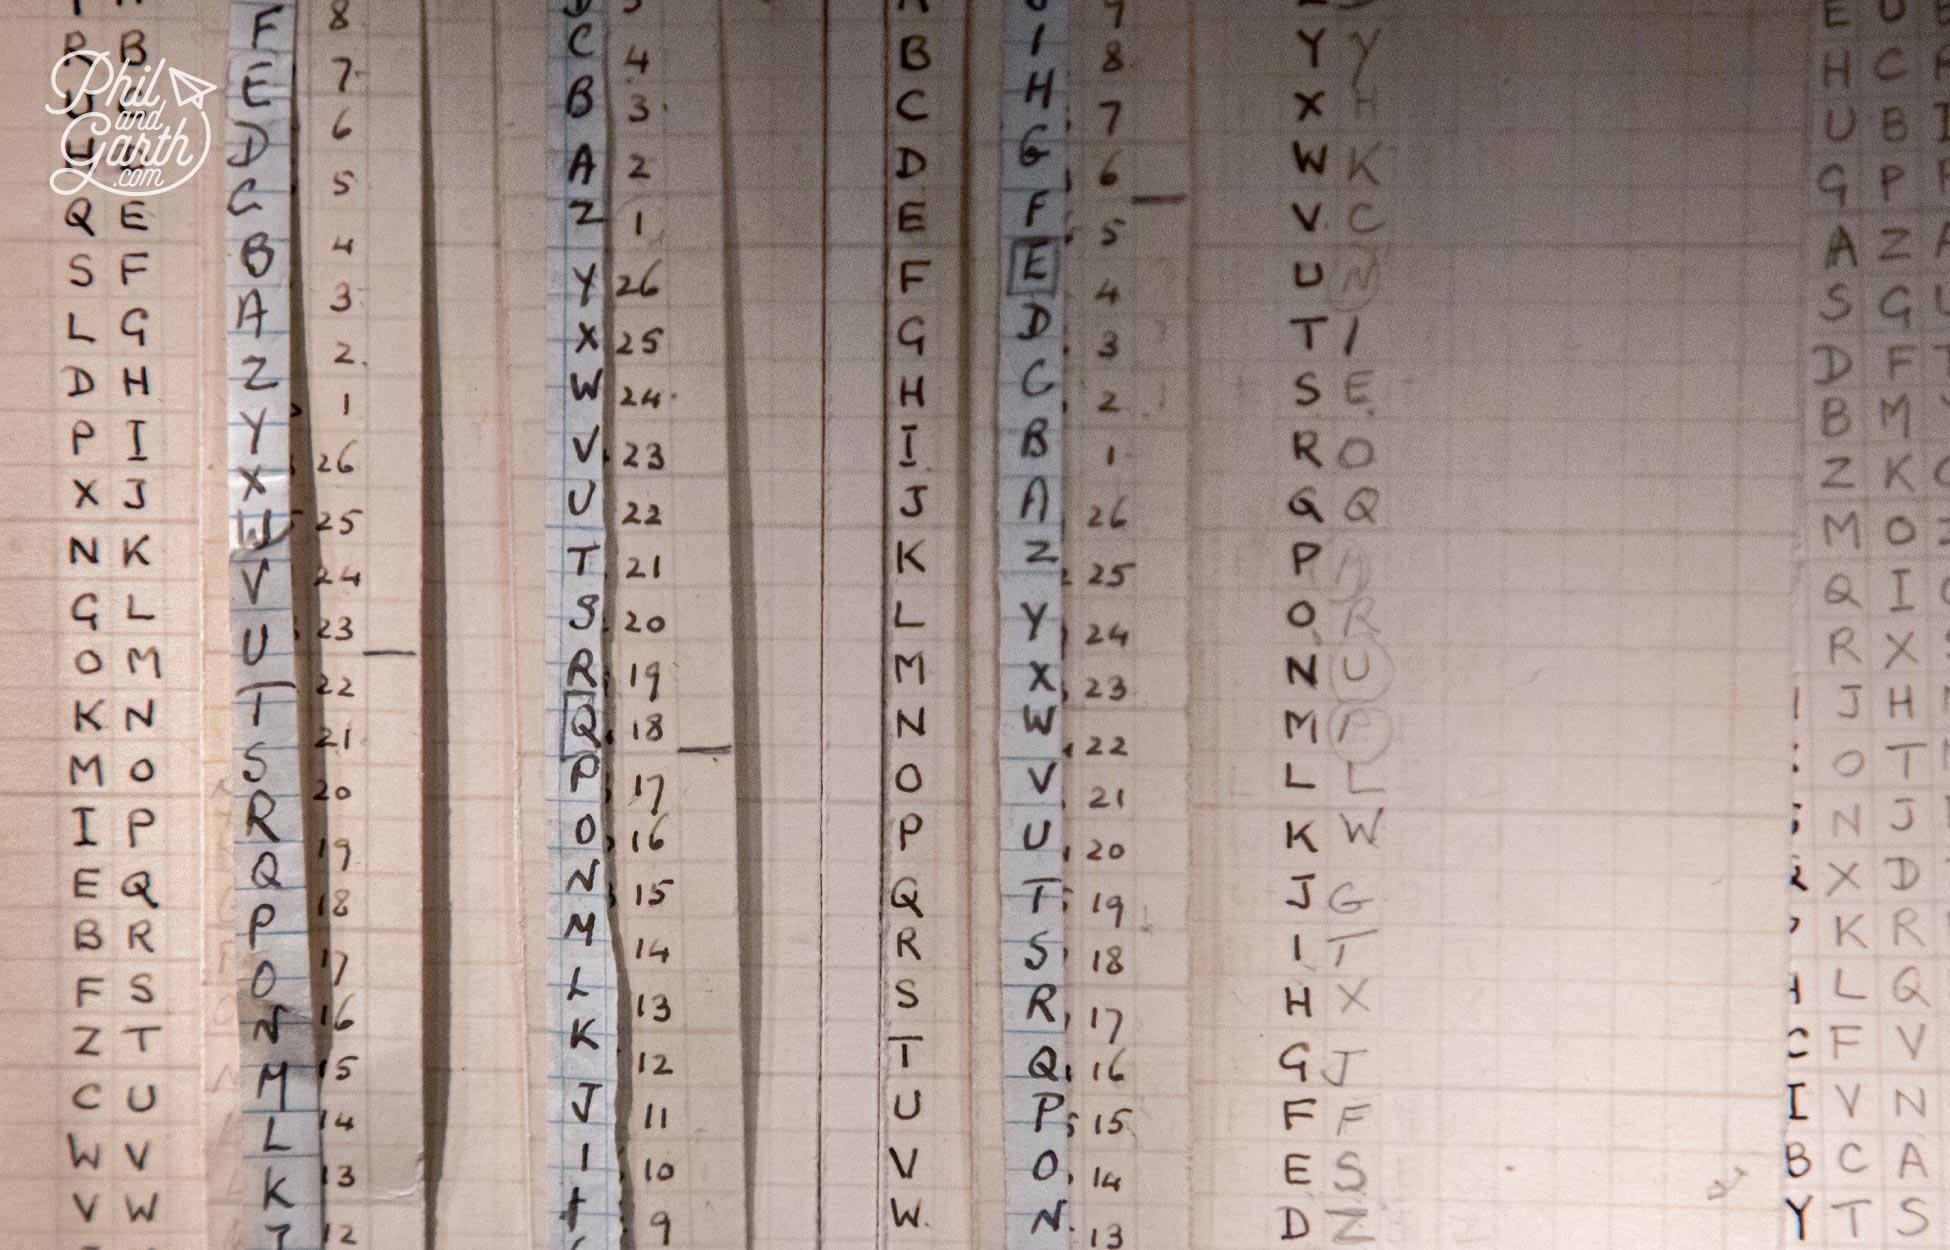 Deciphering Enigma messages